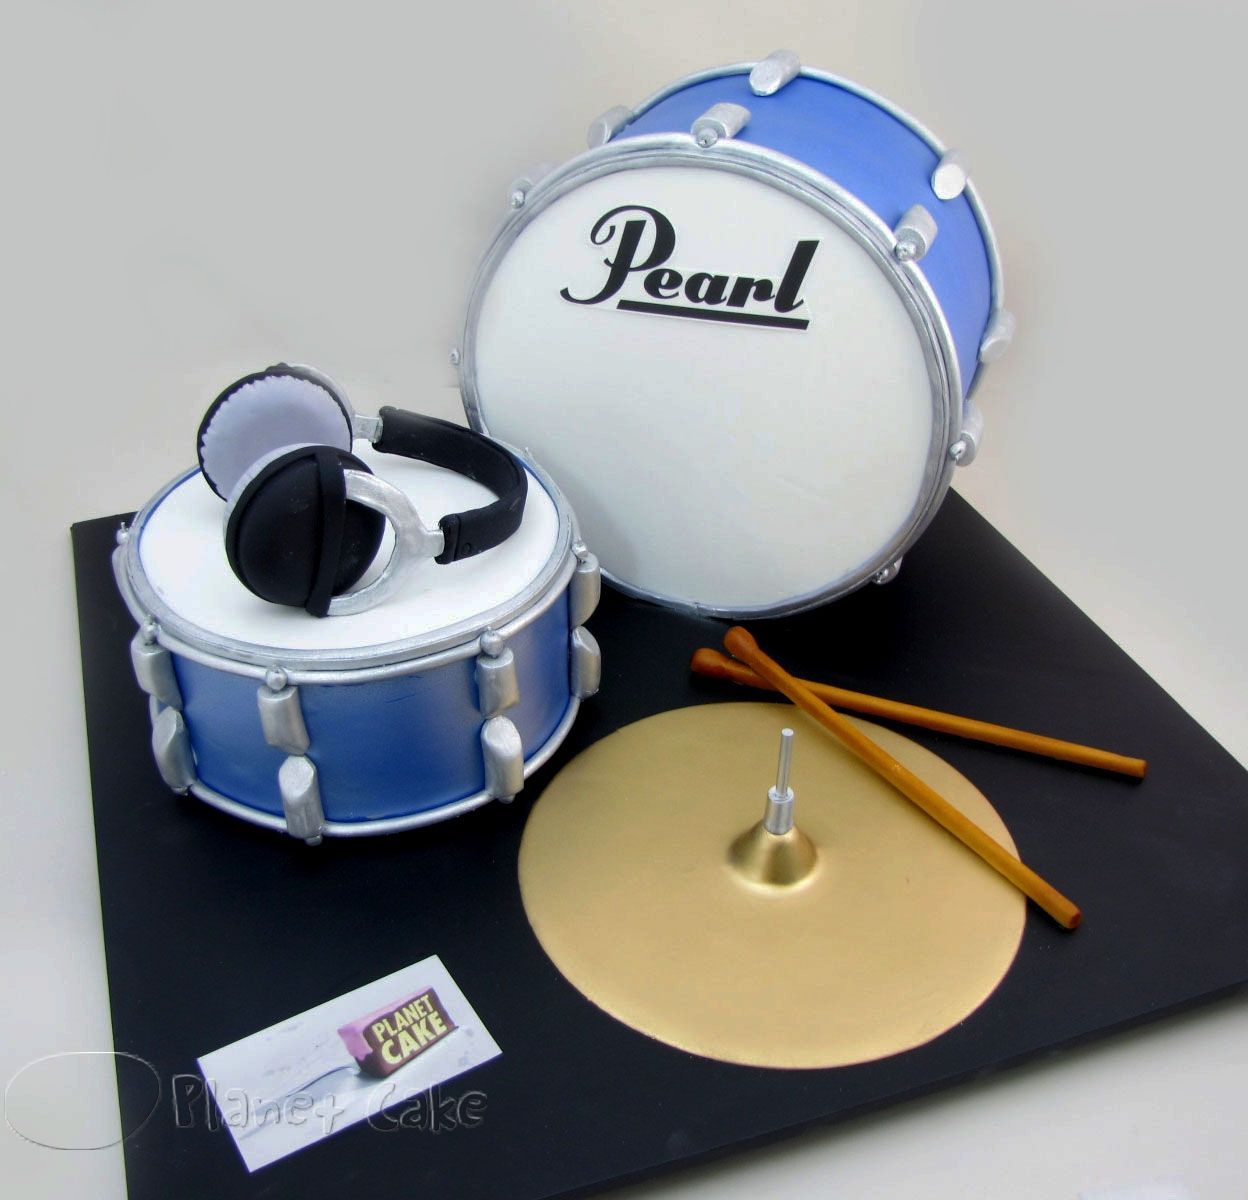 Cake Decorating Drum Kit : Drum Set Cake by www.planetcake.com.au cake decorating ...